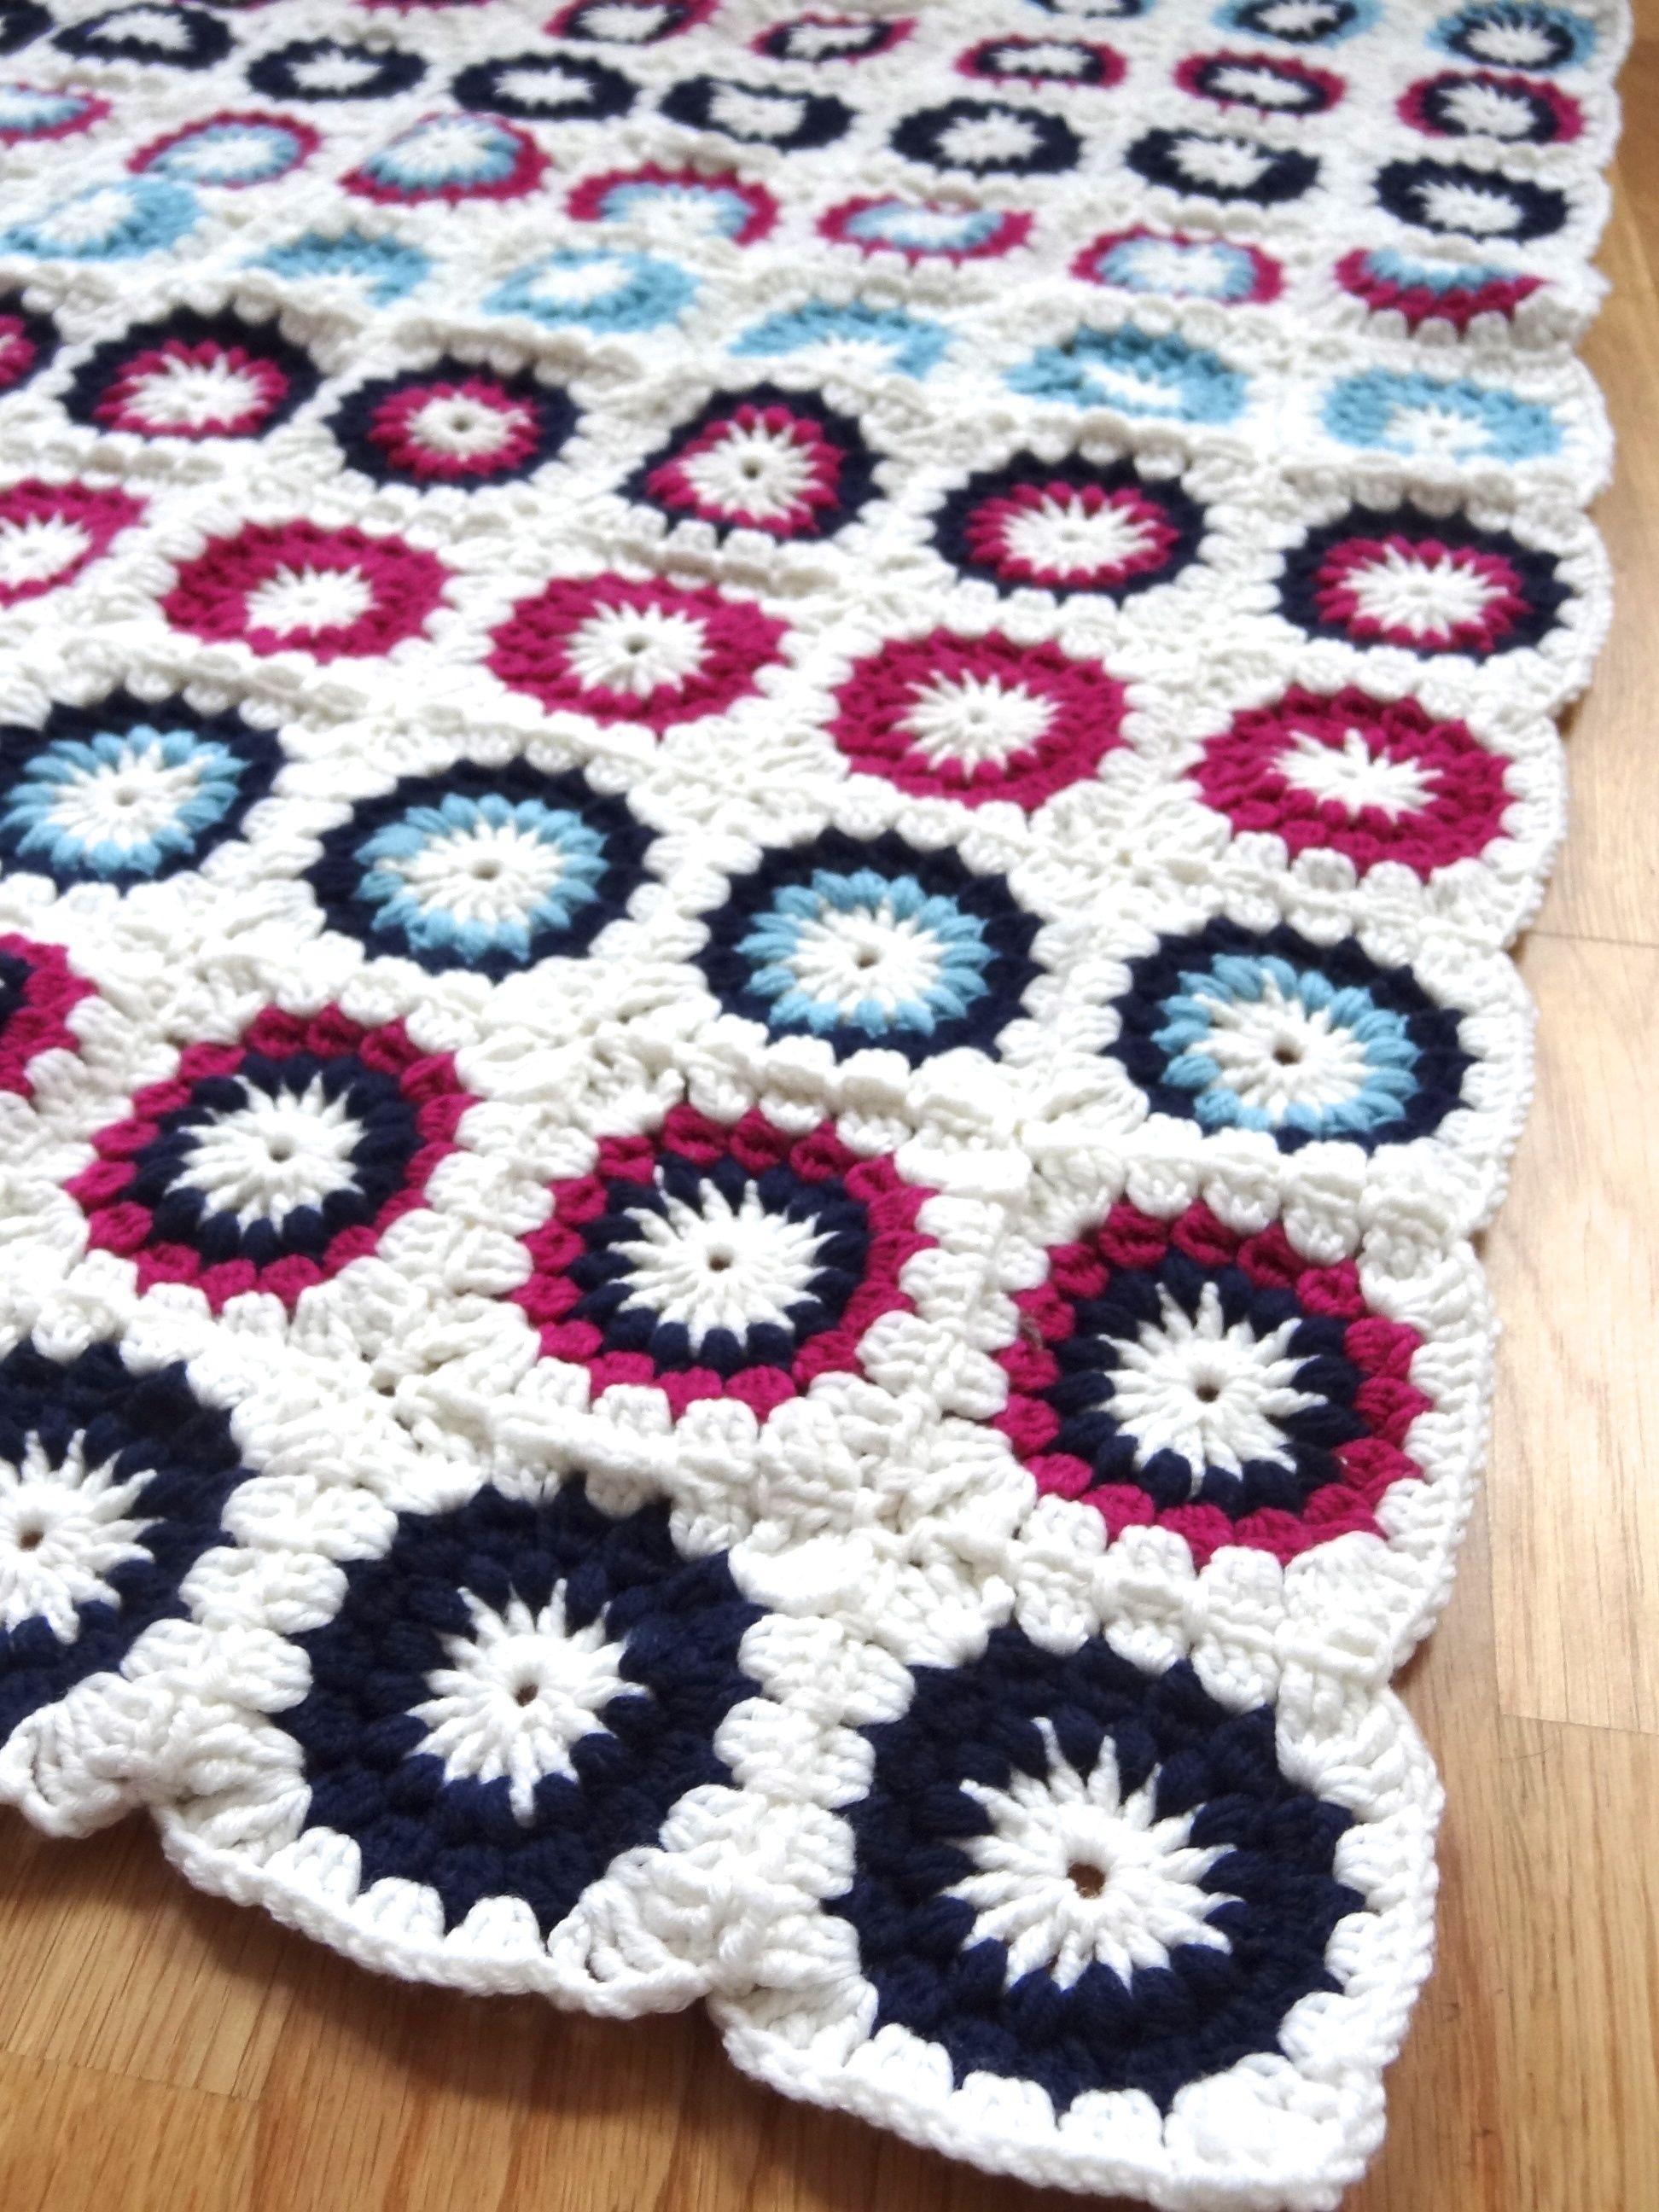 Granny Square Babydecke #Grannysquare #crochet | colchas | Pinterest ...